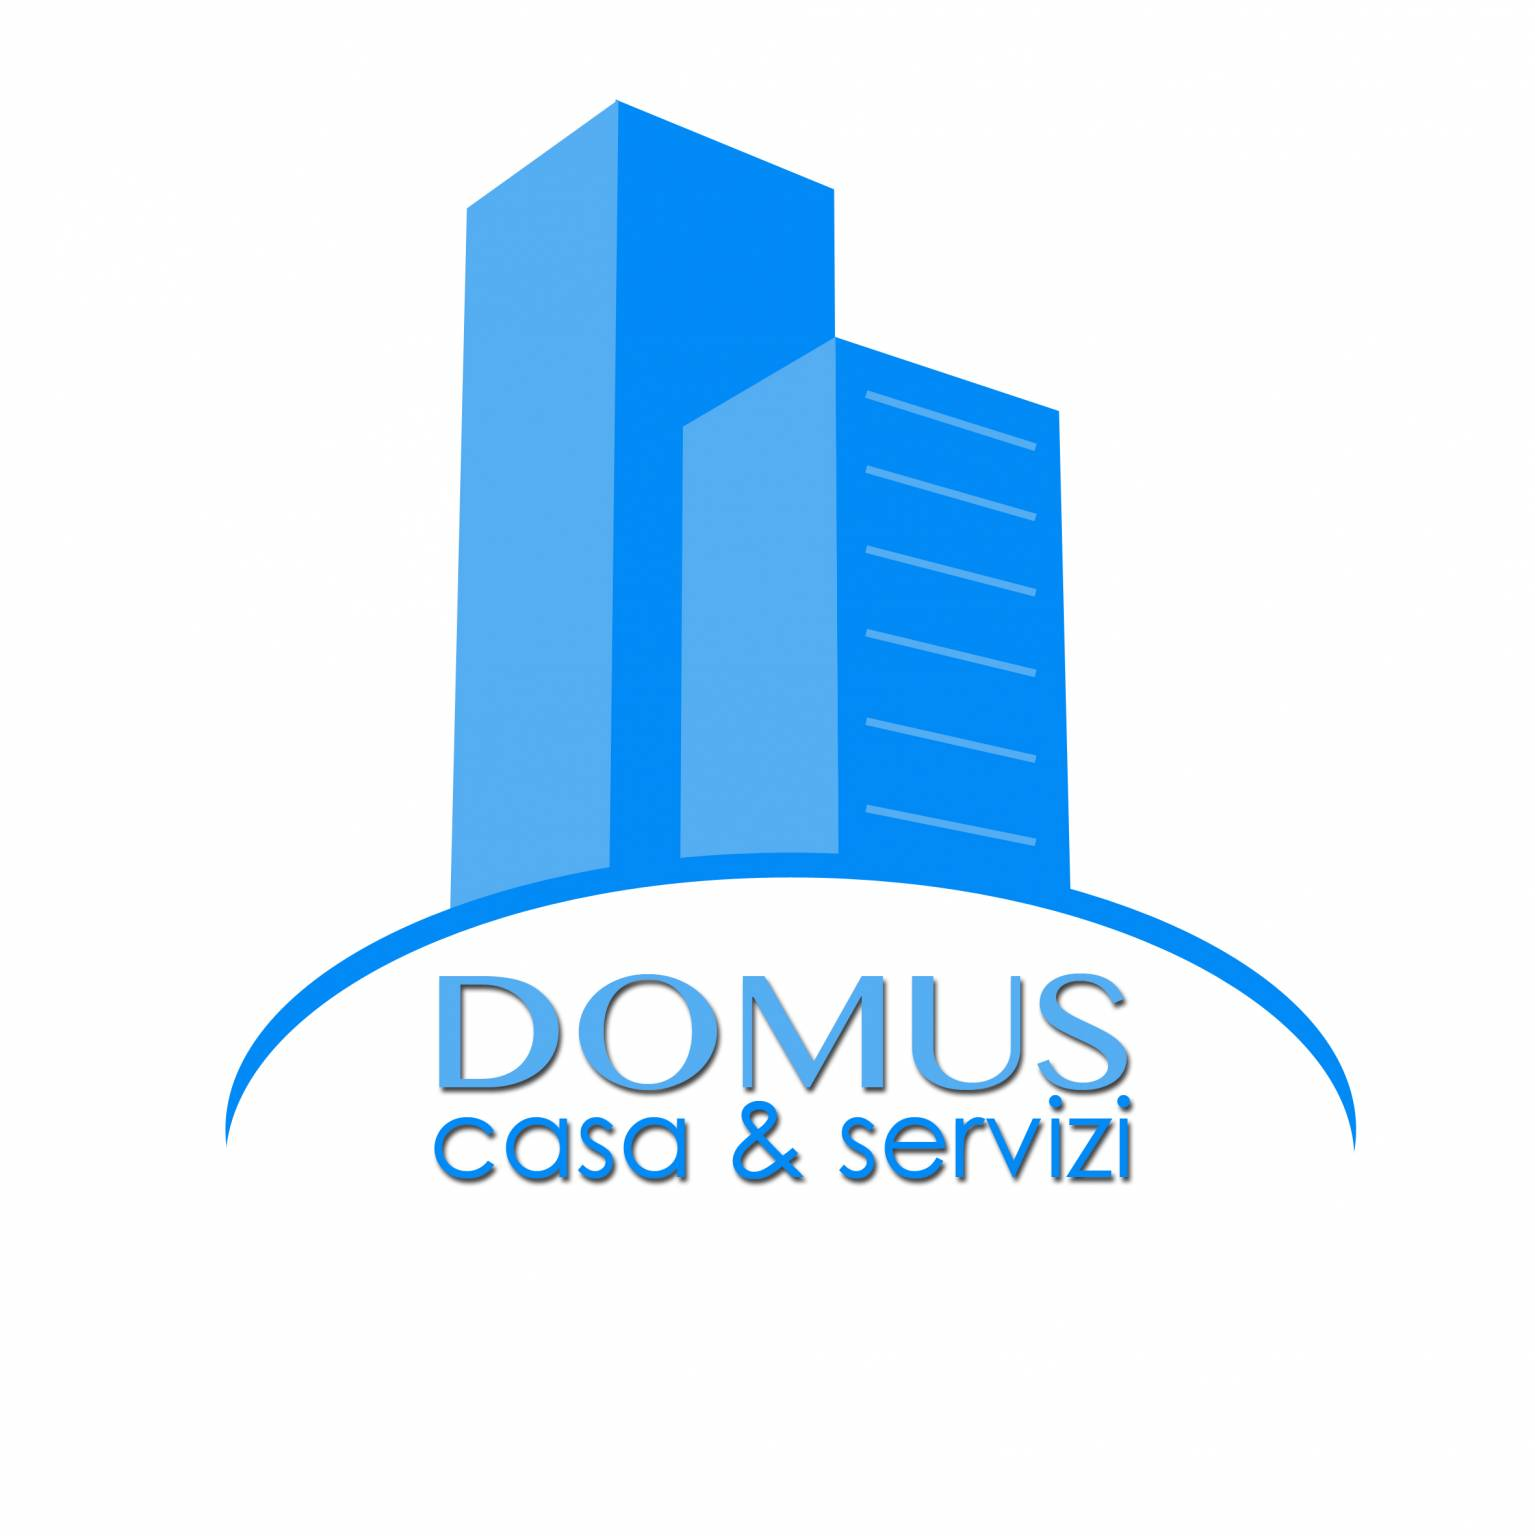 Domuscasa&servizi